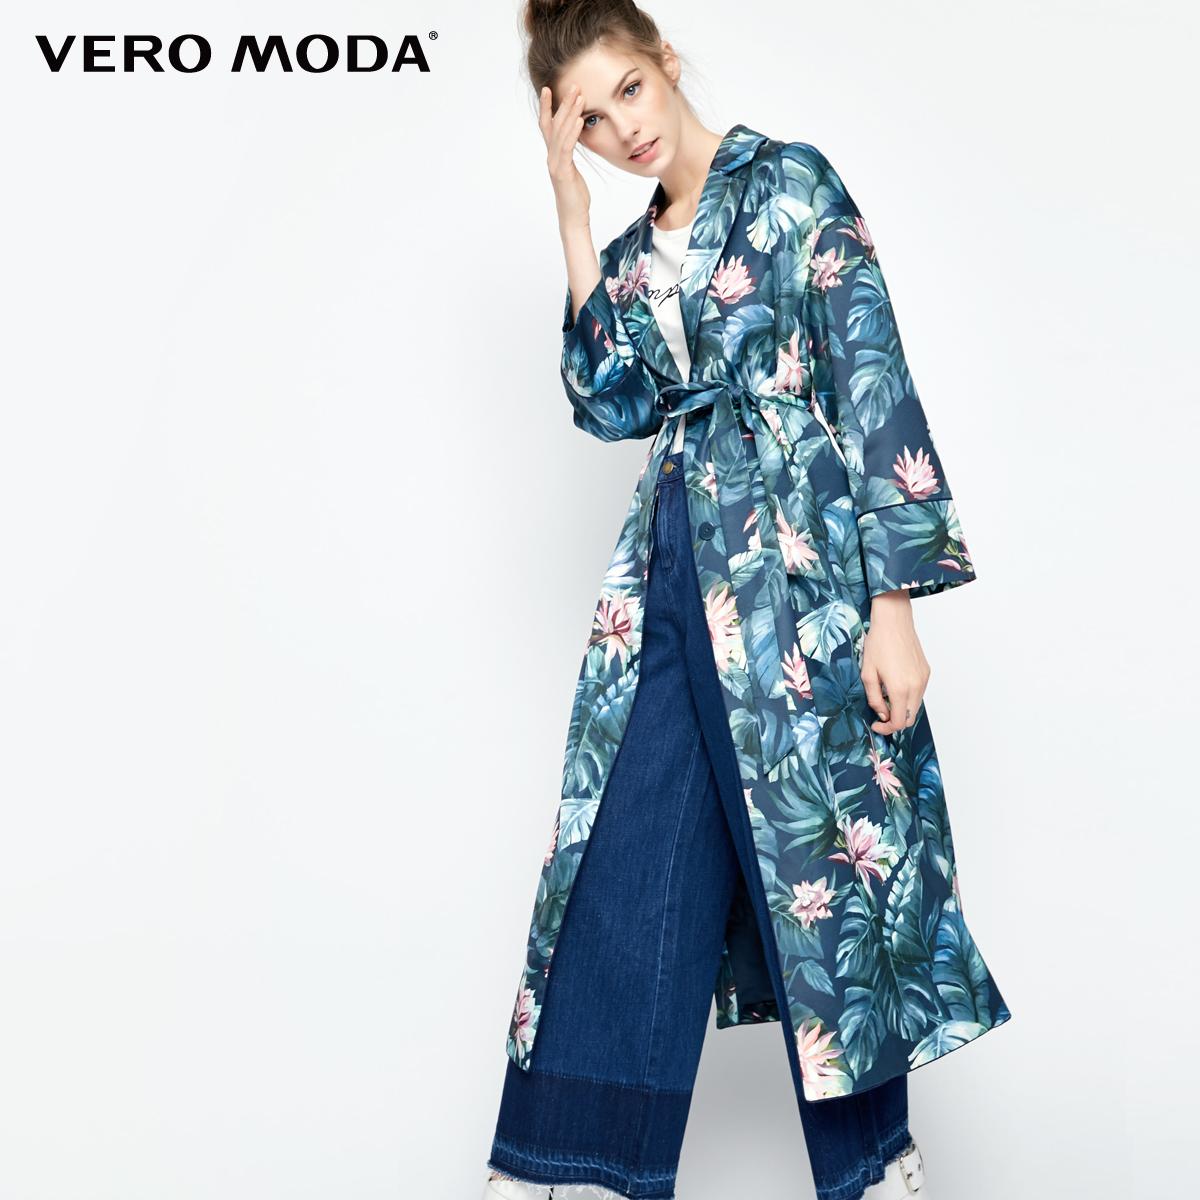 Vero Moda2017秋季新款数码印花睡衣风风衣外套|317321515